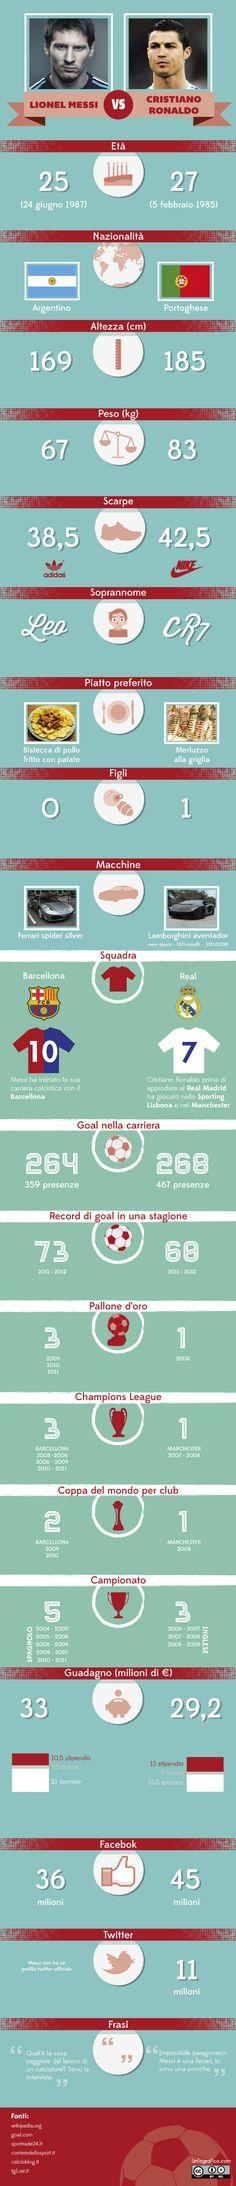 Lionel Messi VS Cristiano Ronaldo Do you fancy an infographic? If you want your own please visit http://www.linfografico.com/prezzi/ Vuoi realizzare un'infografica tutta tua? Visita http://www.linfografico.com/prezzi/